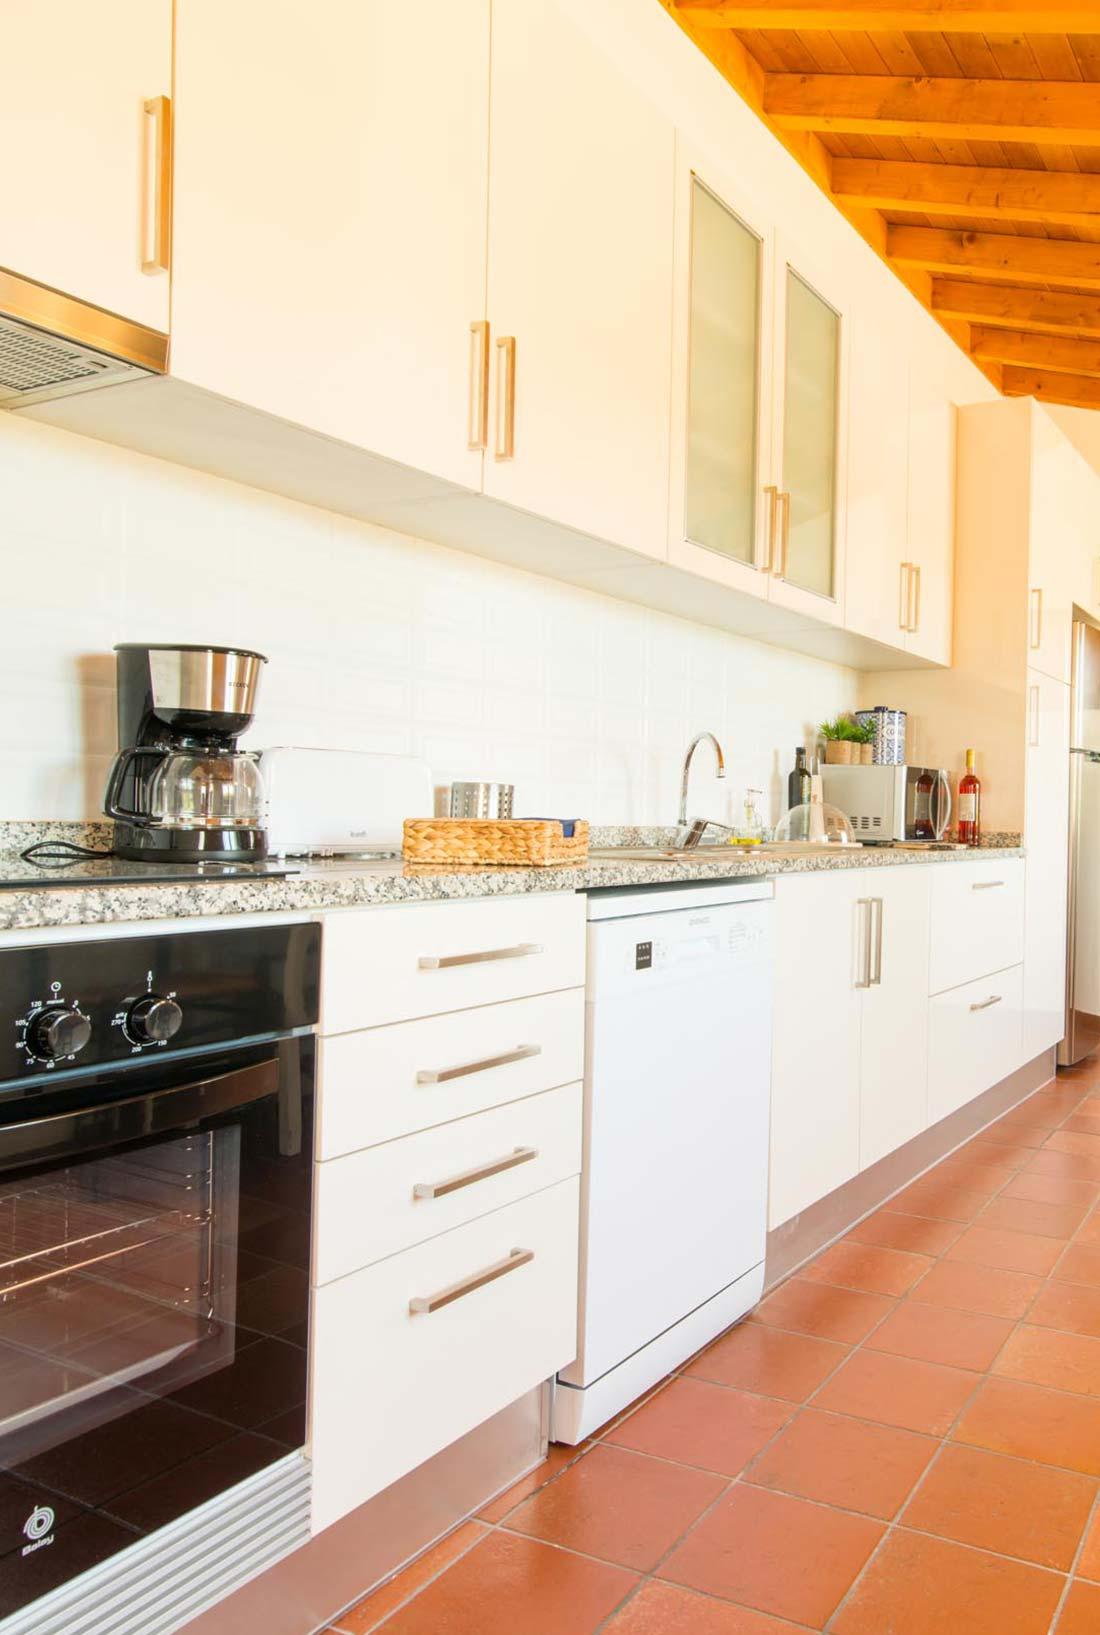 Villa Oliva interiors